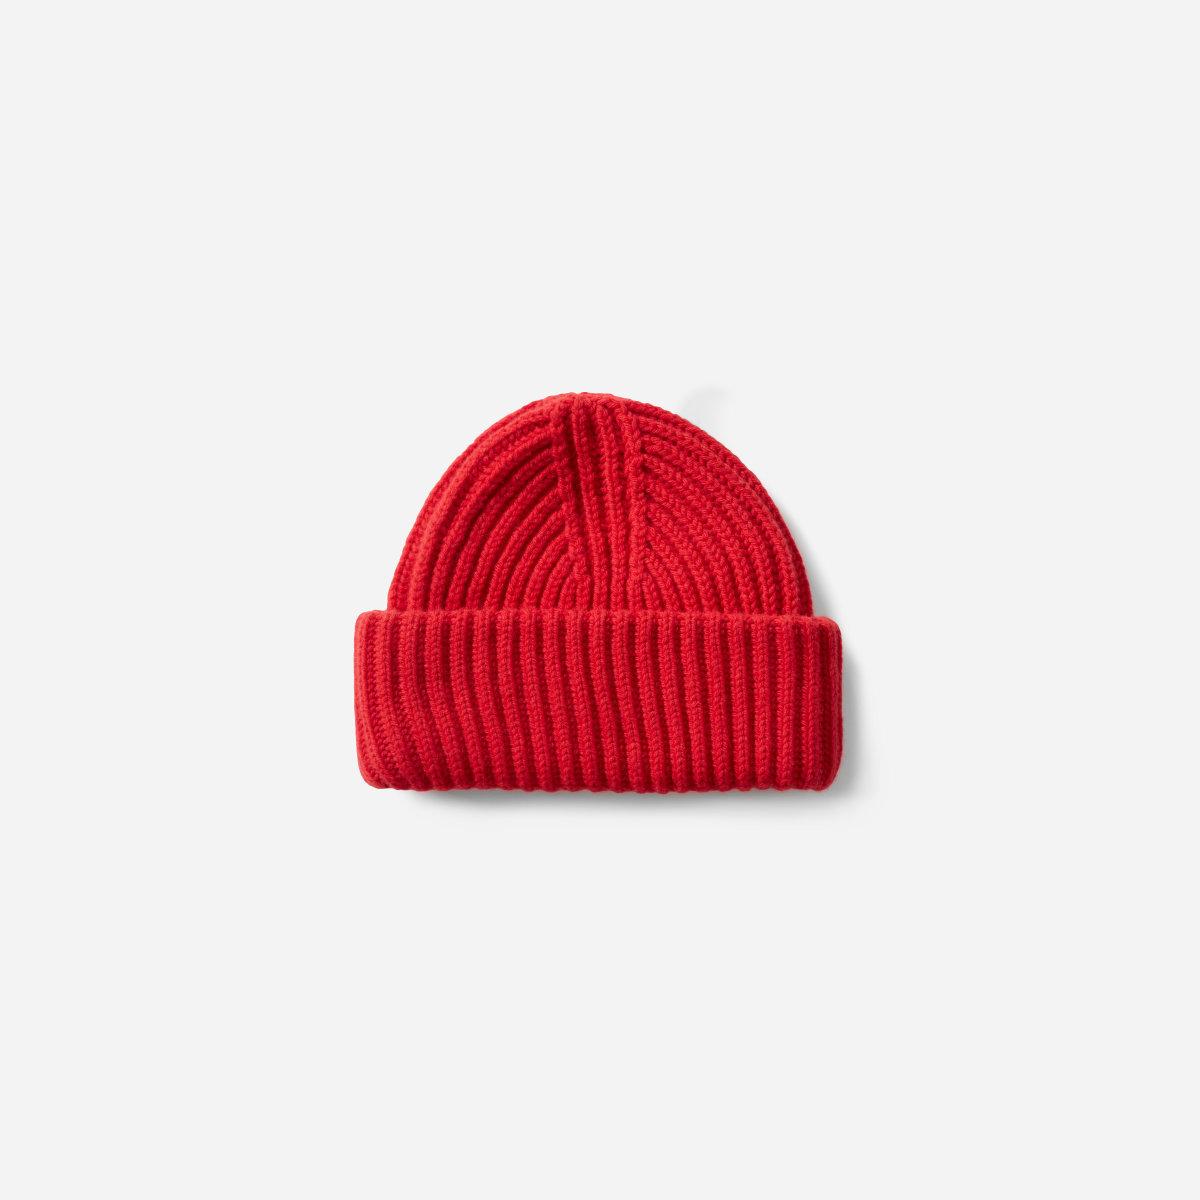 588730ef011 Fishermen Beanie Winter Hats